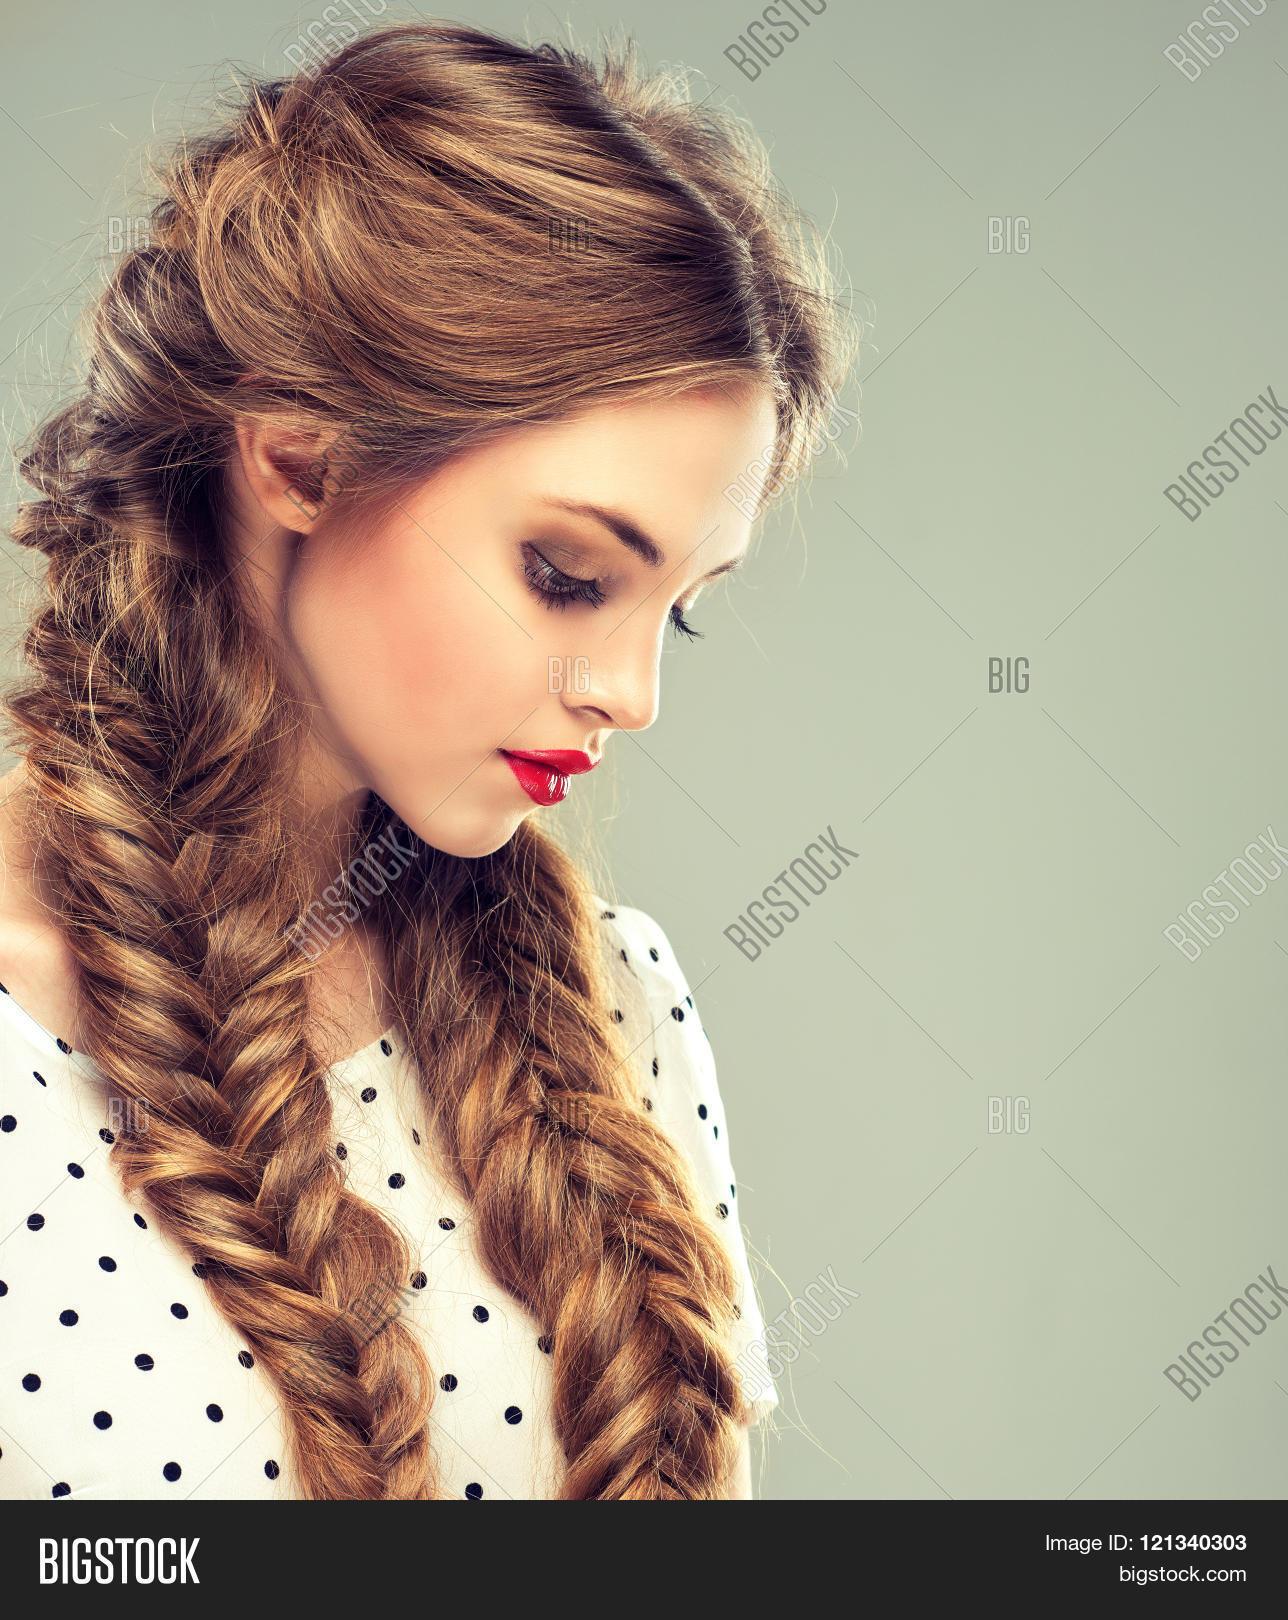 hair Bikini brunette two pigtails